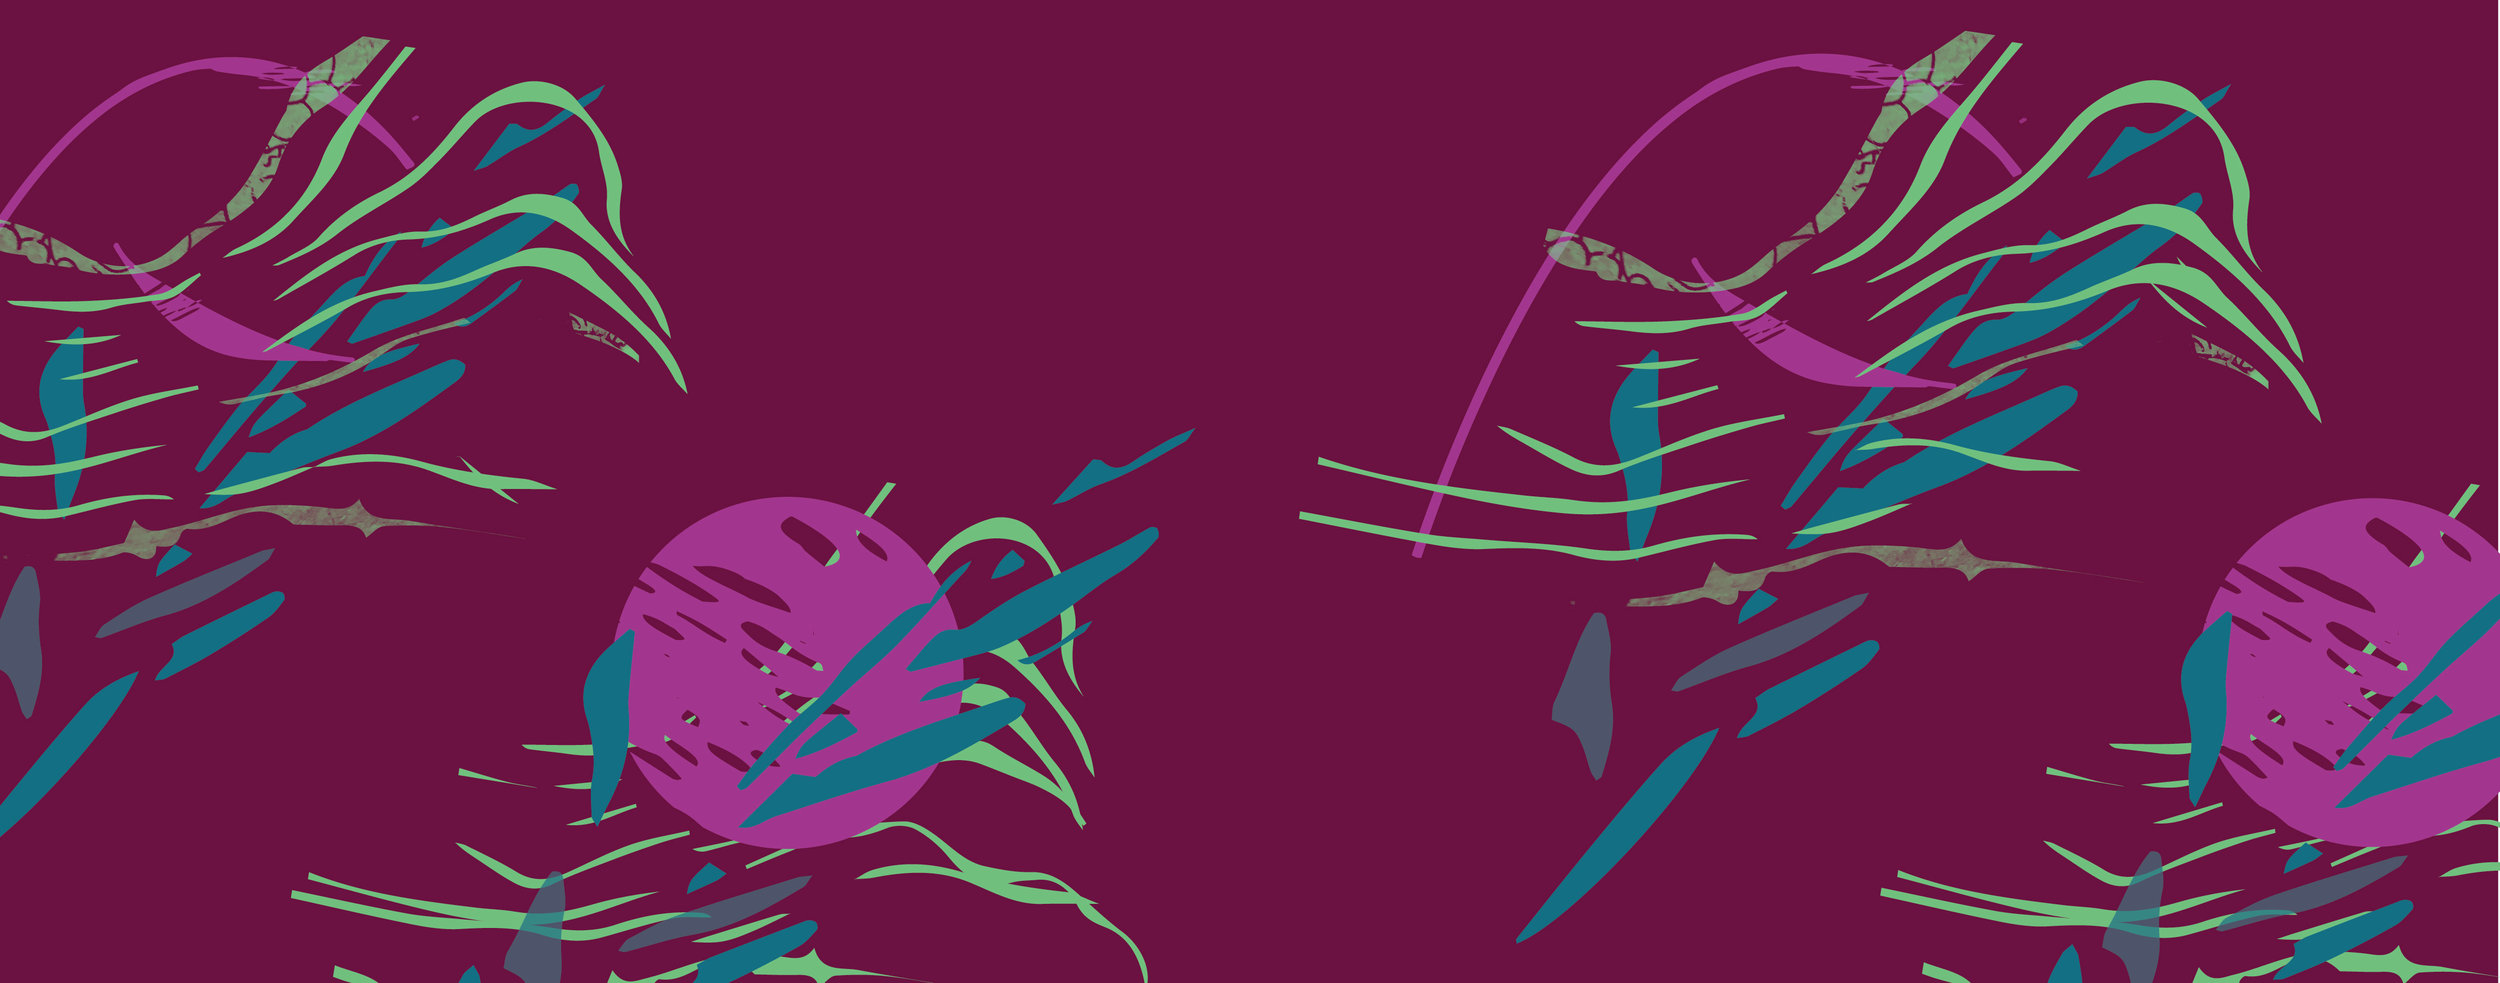 JeniDoddTea_GraphicElements-09.jpg